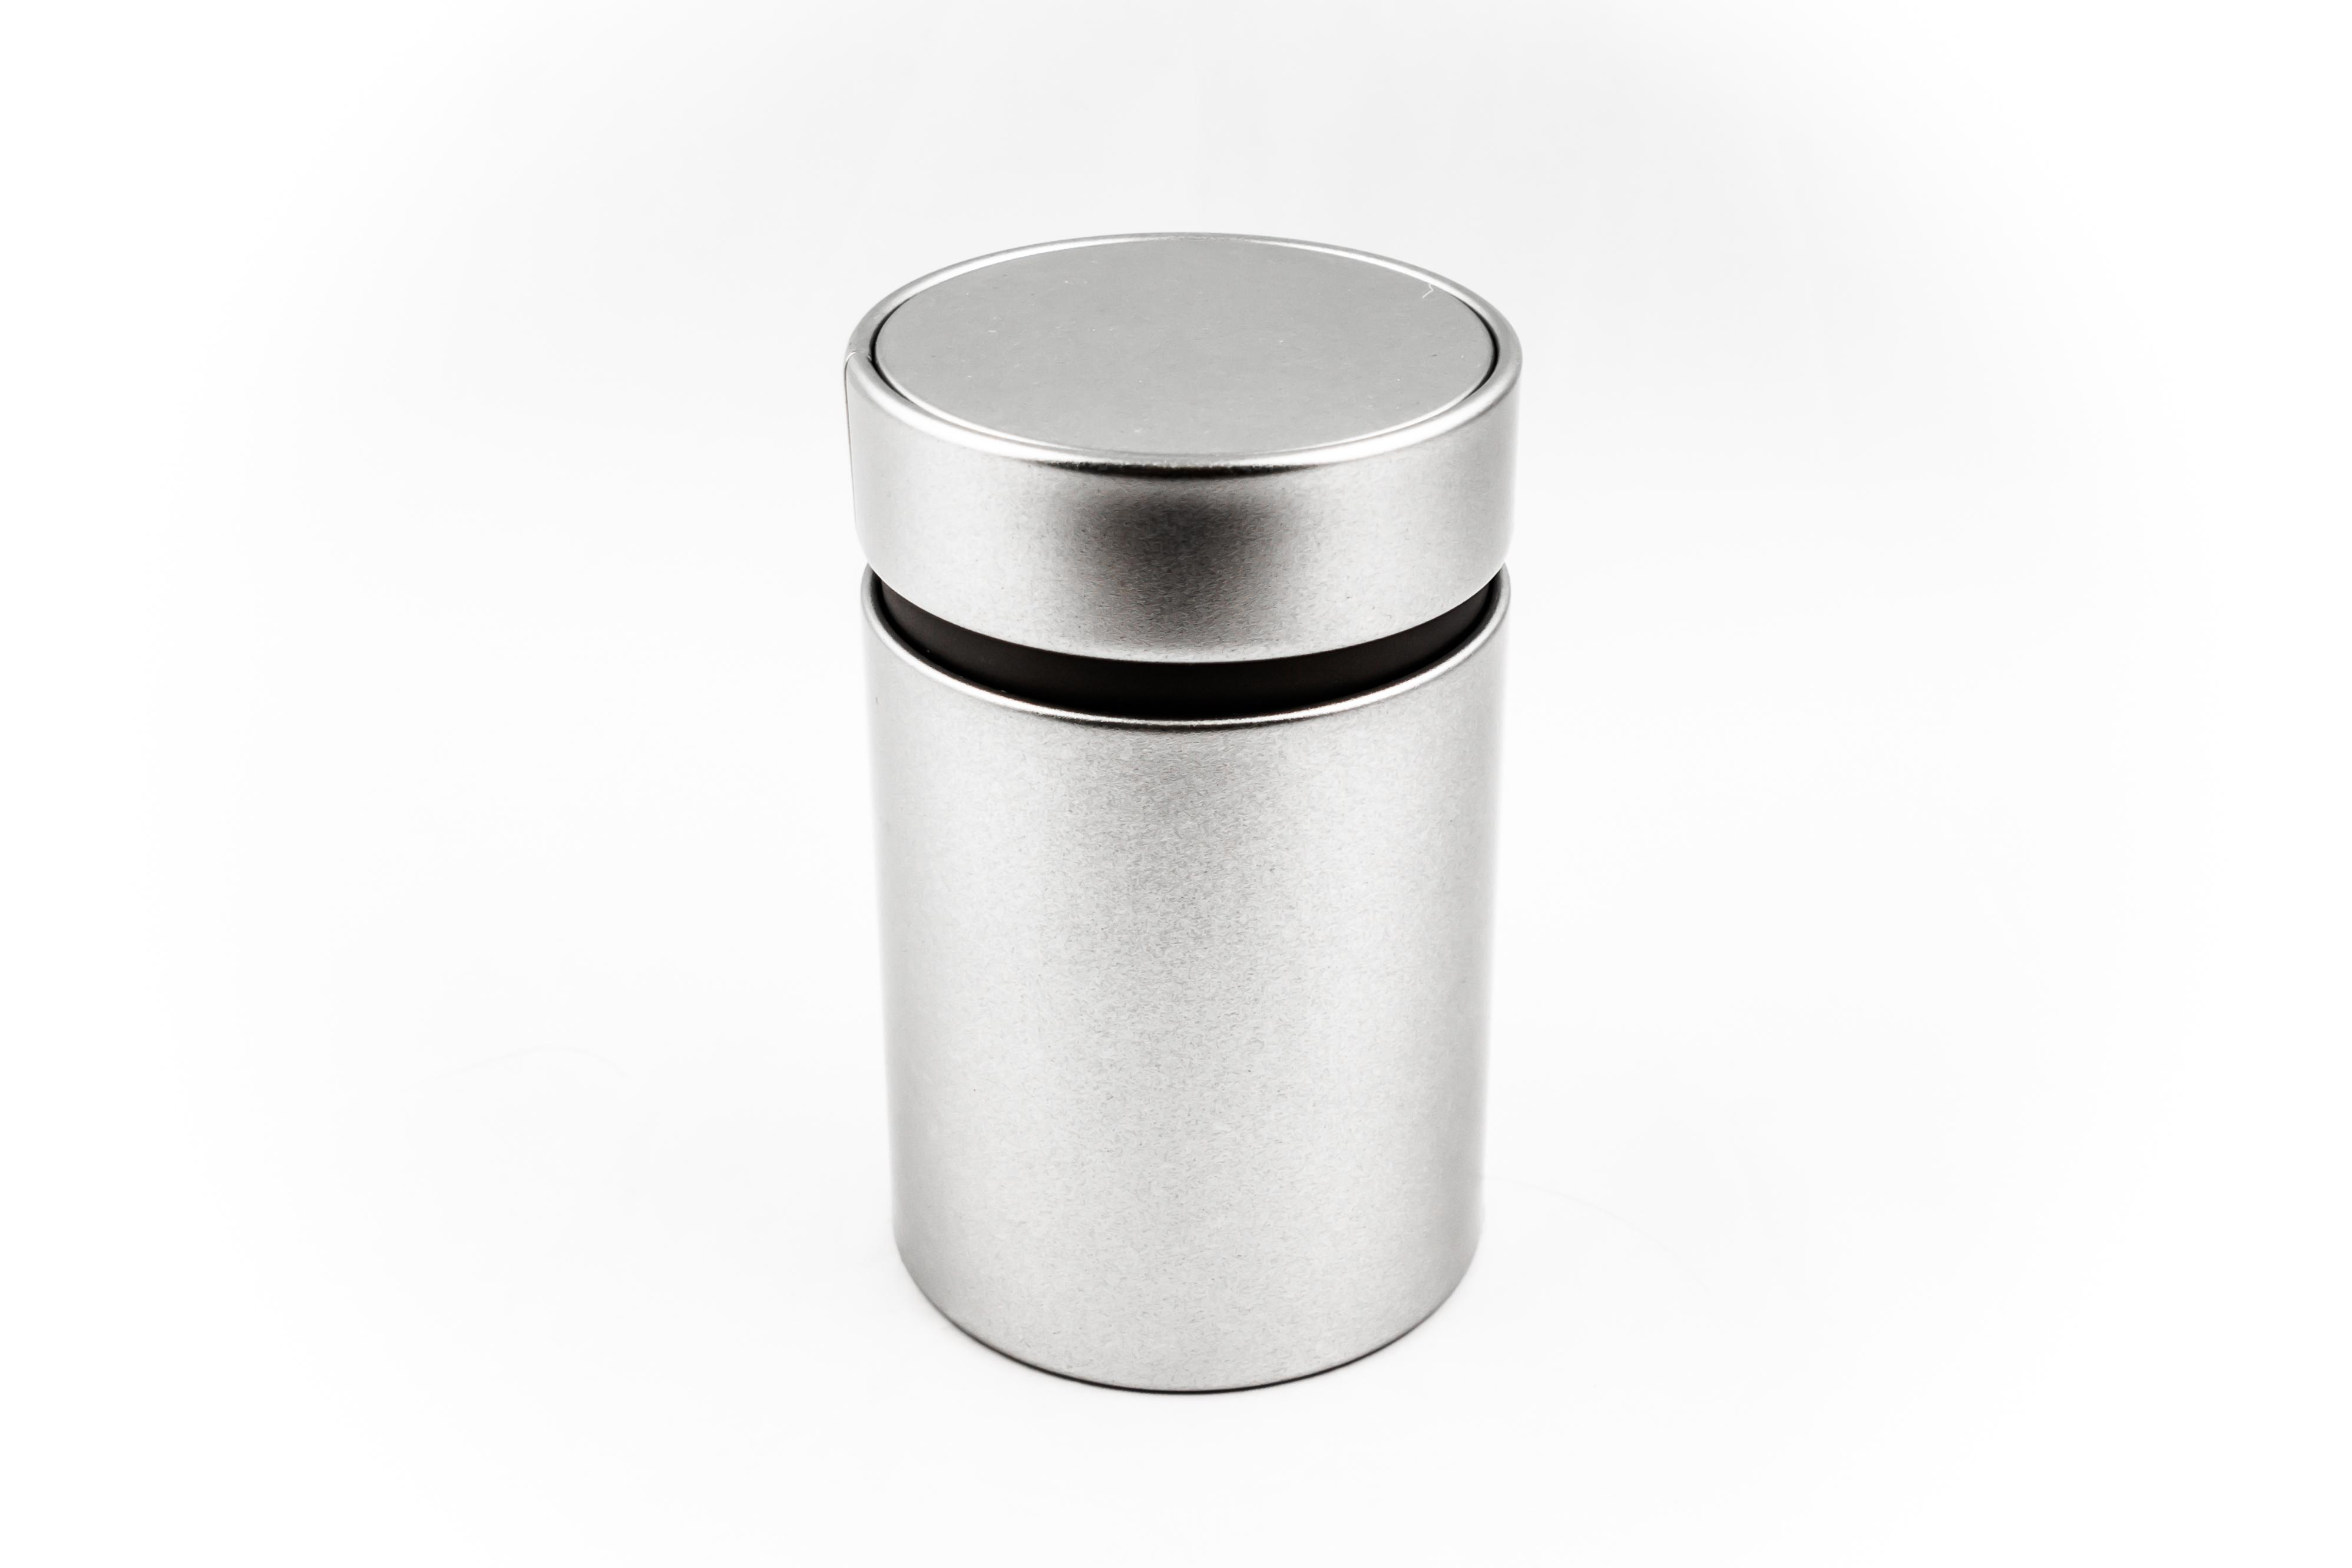 Round tinbox, premium with innerlid, sandblasted material